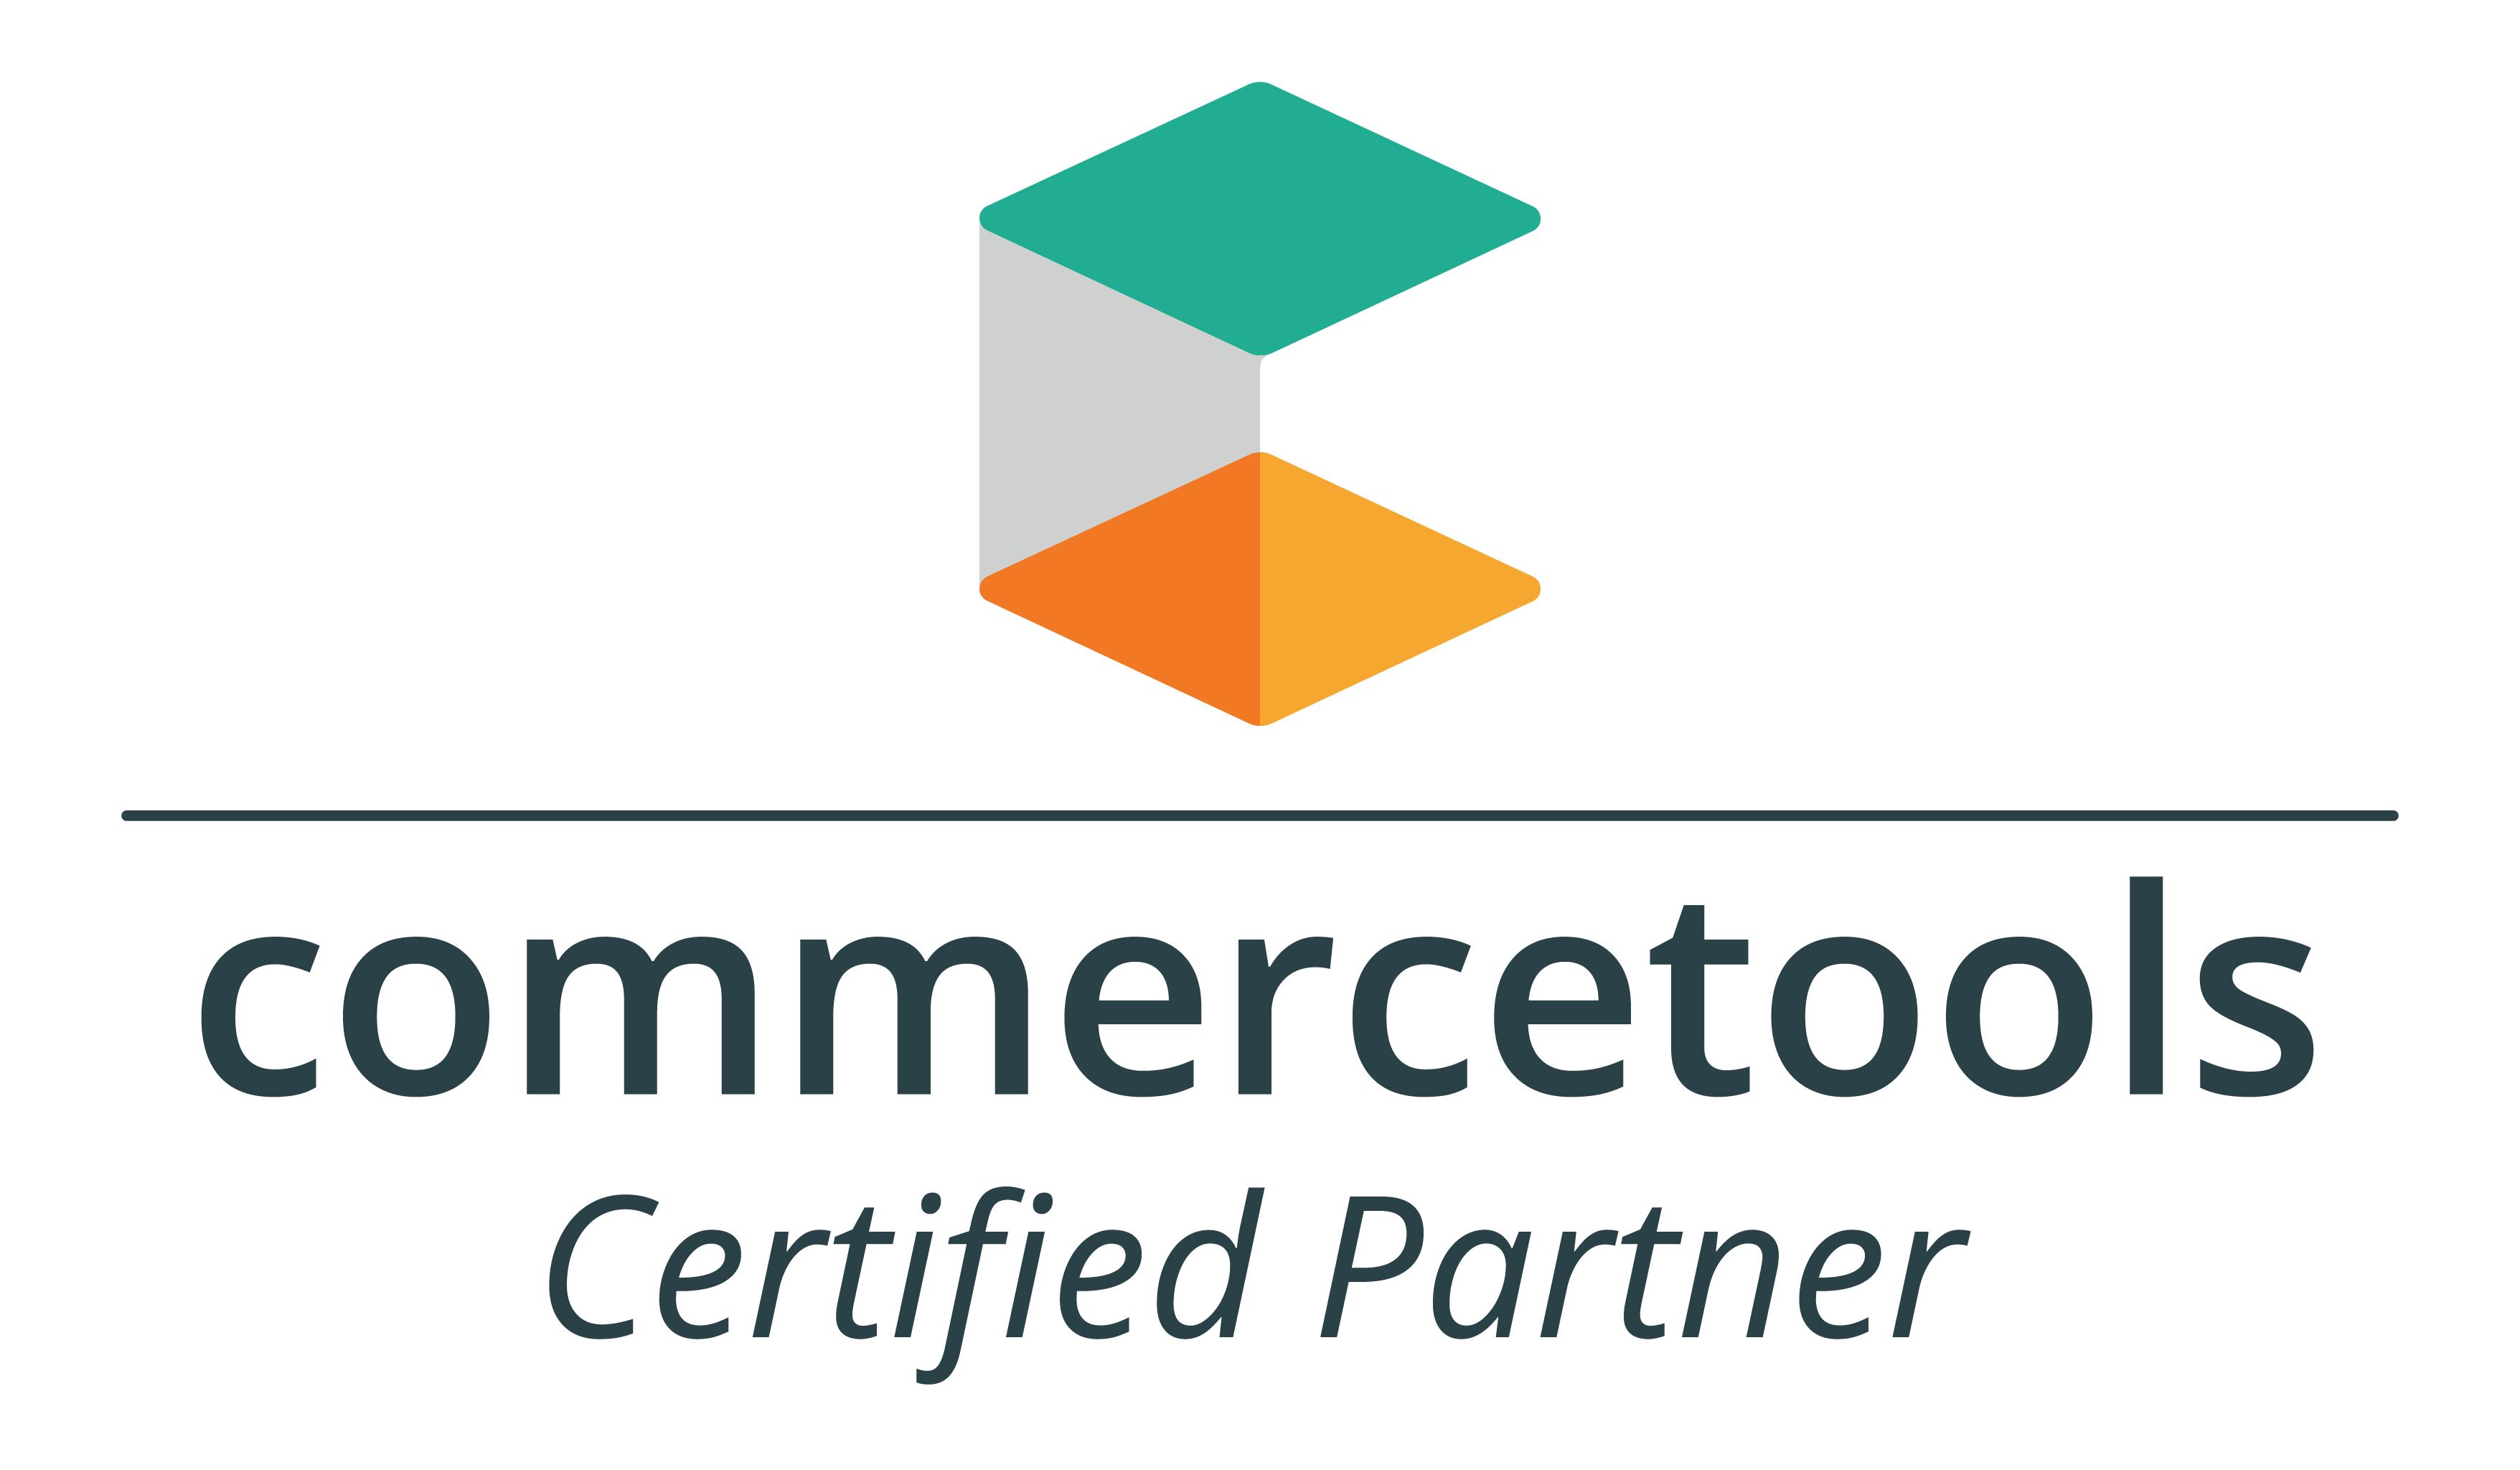 commercetools-certified-partner-hoch